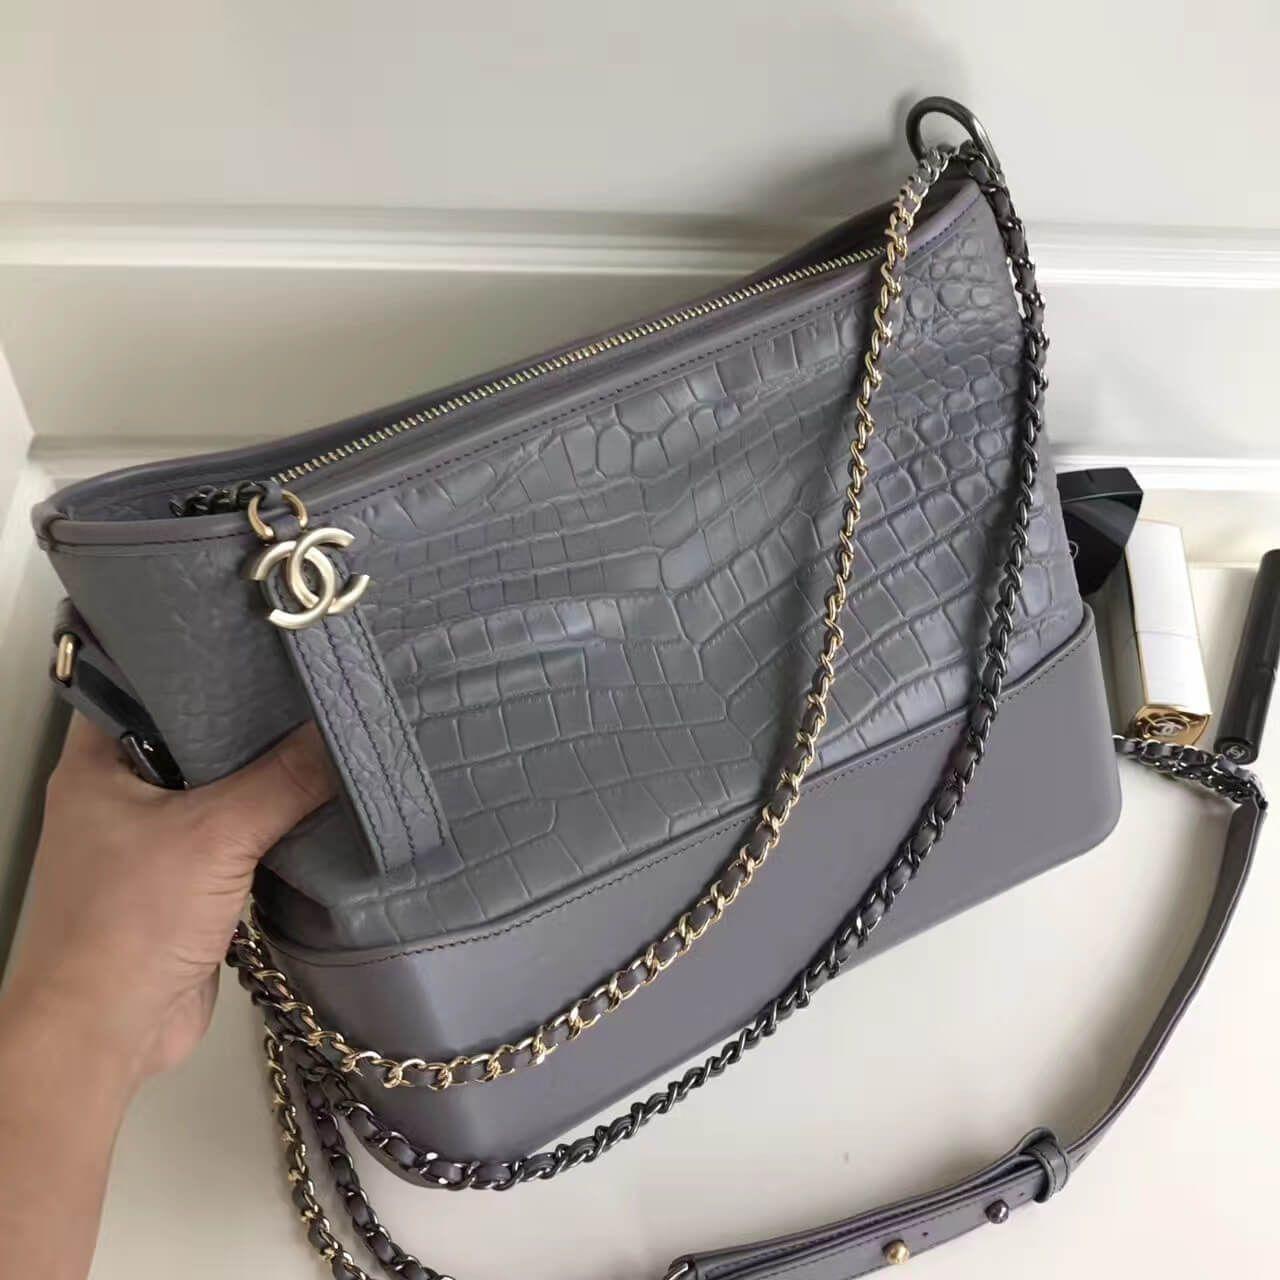 b34e9a6b2210 Chanel Gabrielle Medium Hobo Bag in Crocodile Pattern Calfskin A93824 Grey  2017